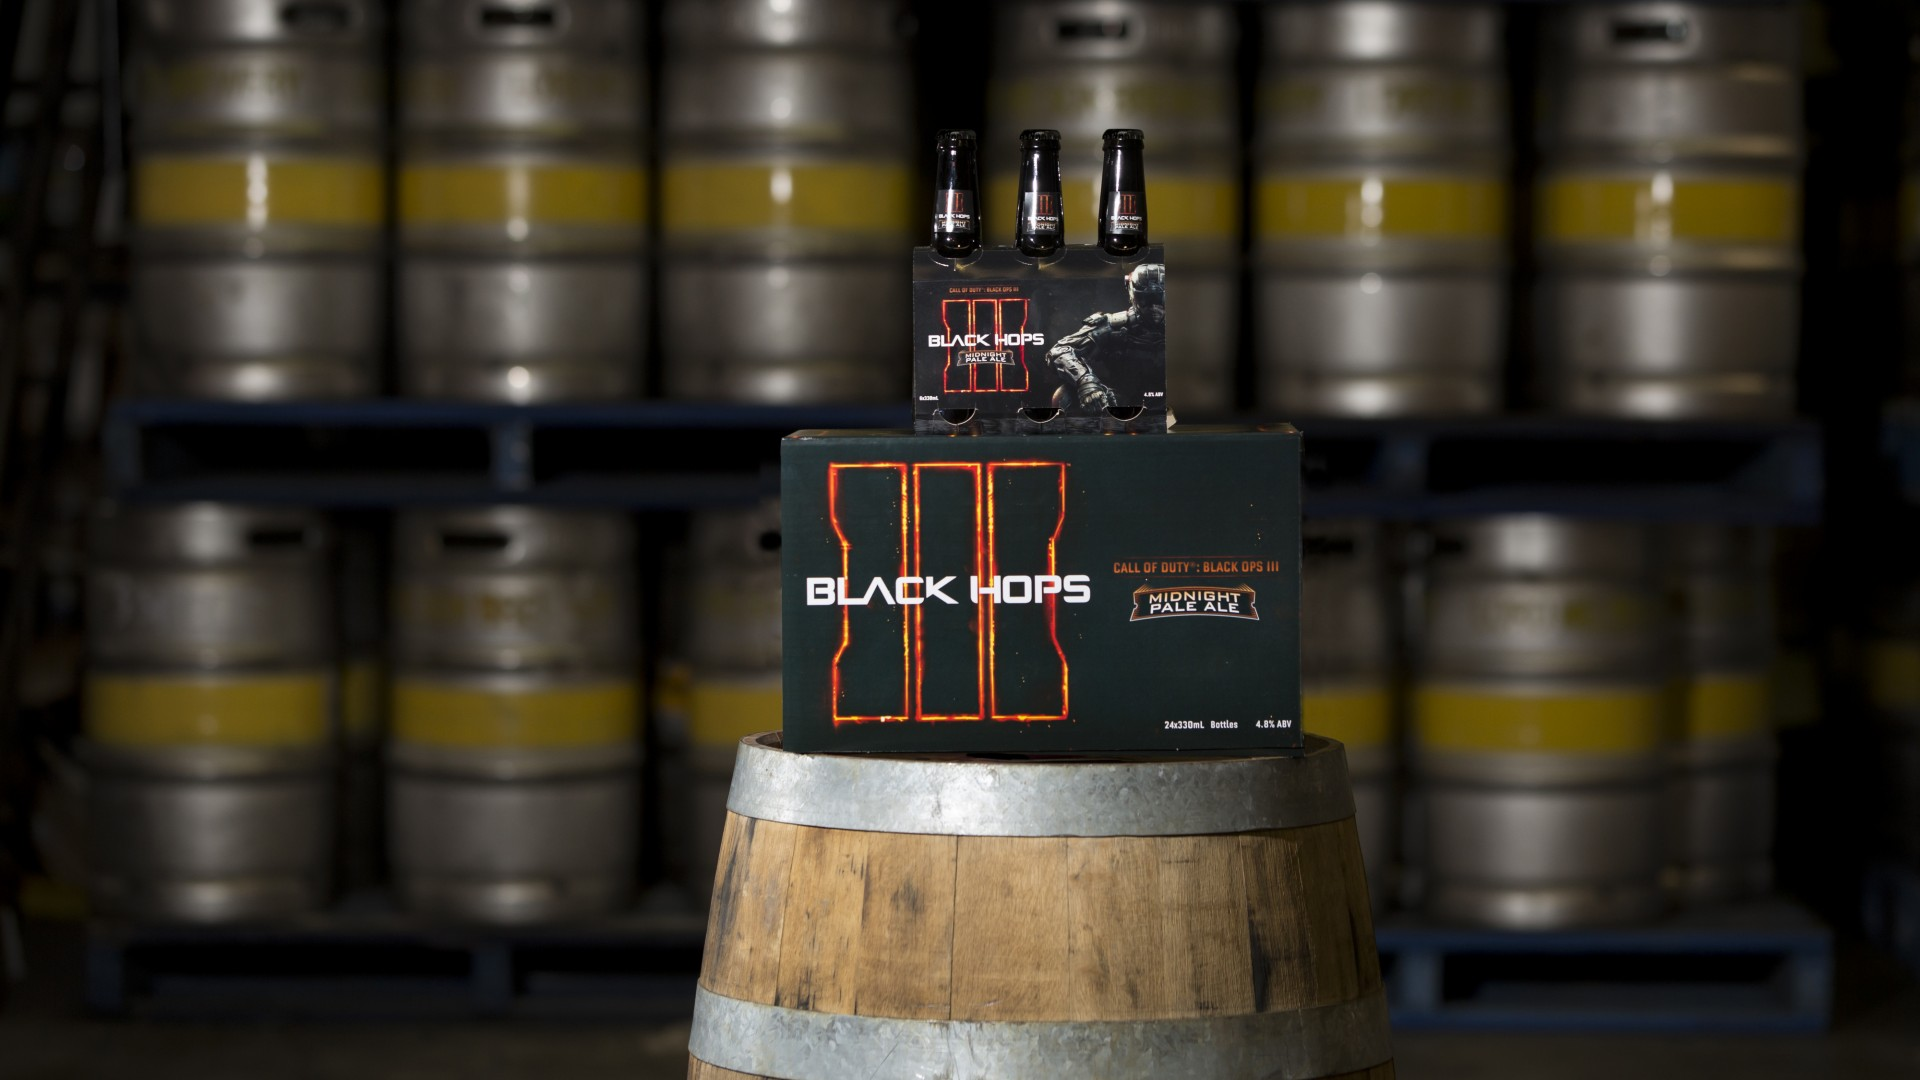 Call of Duty Black Hops Beer - bottles and case on barrel